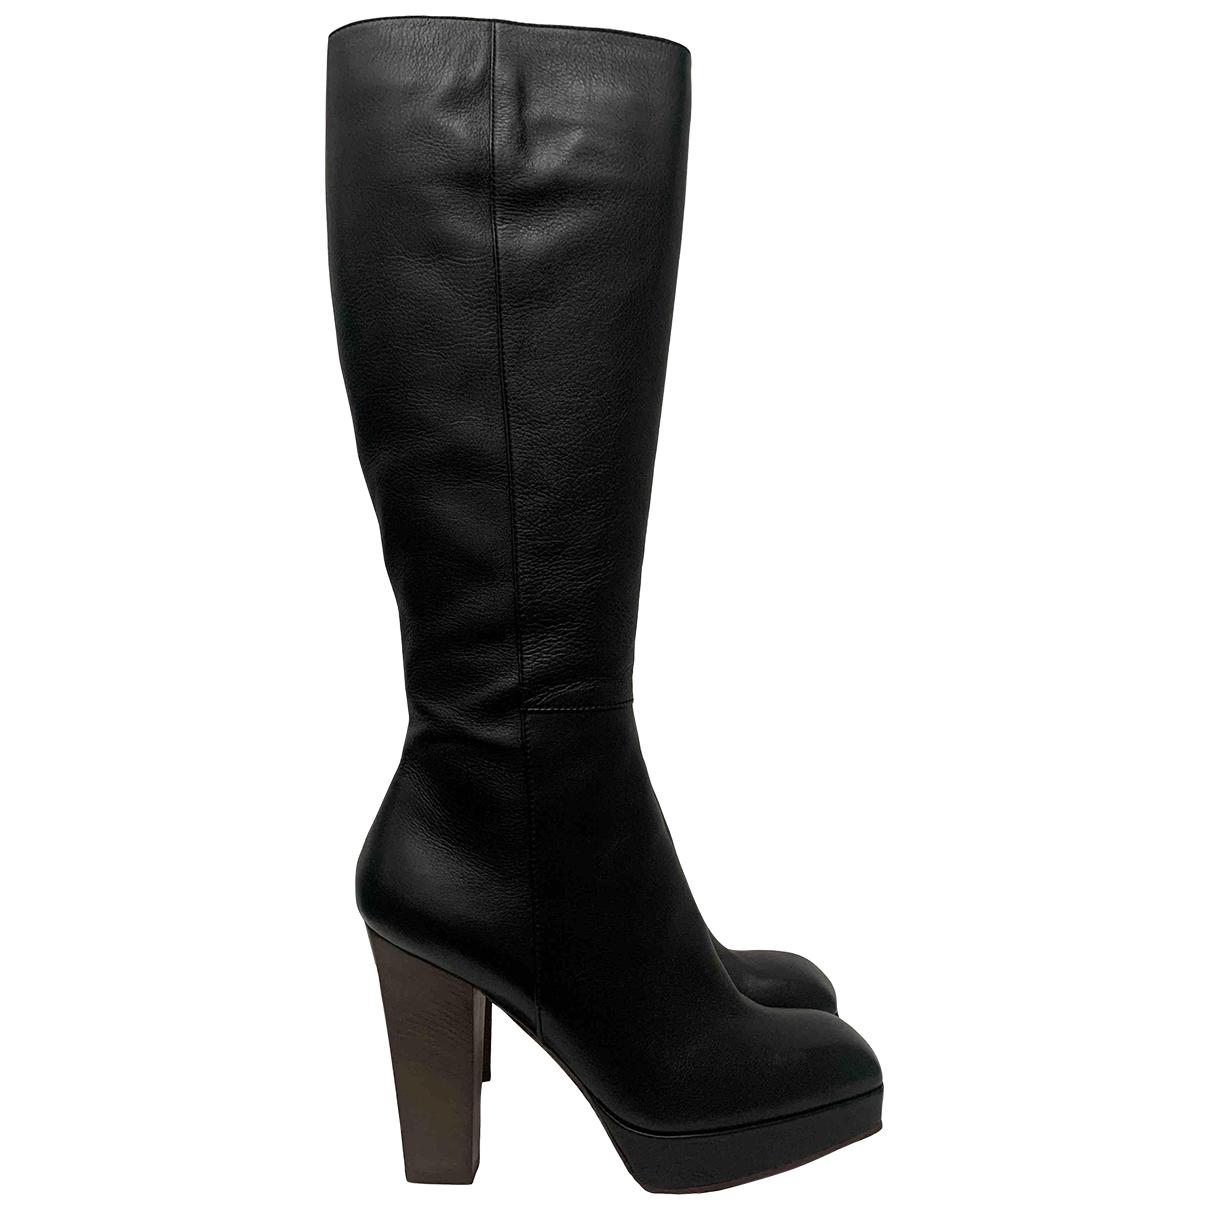 Yves Saint Laurent \N Black Leather Boots for Women 39.5 EU